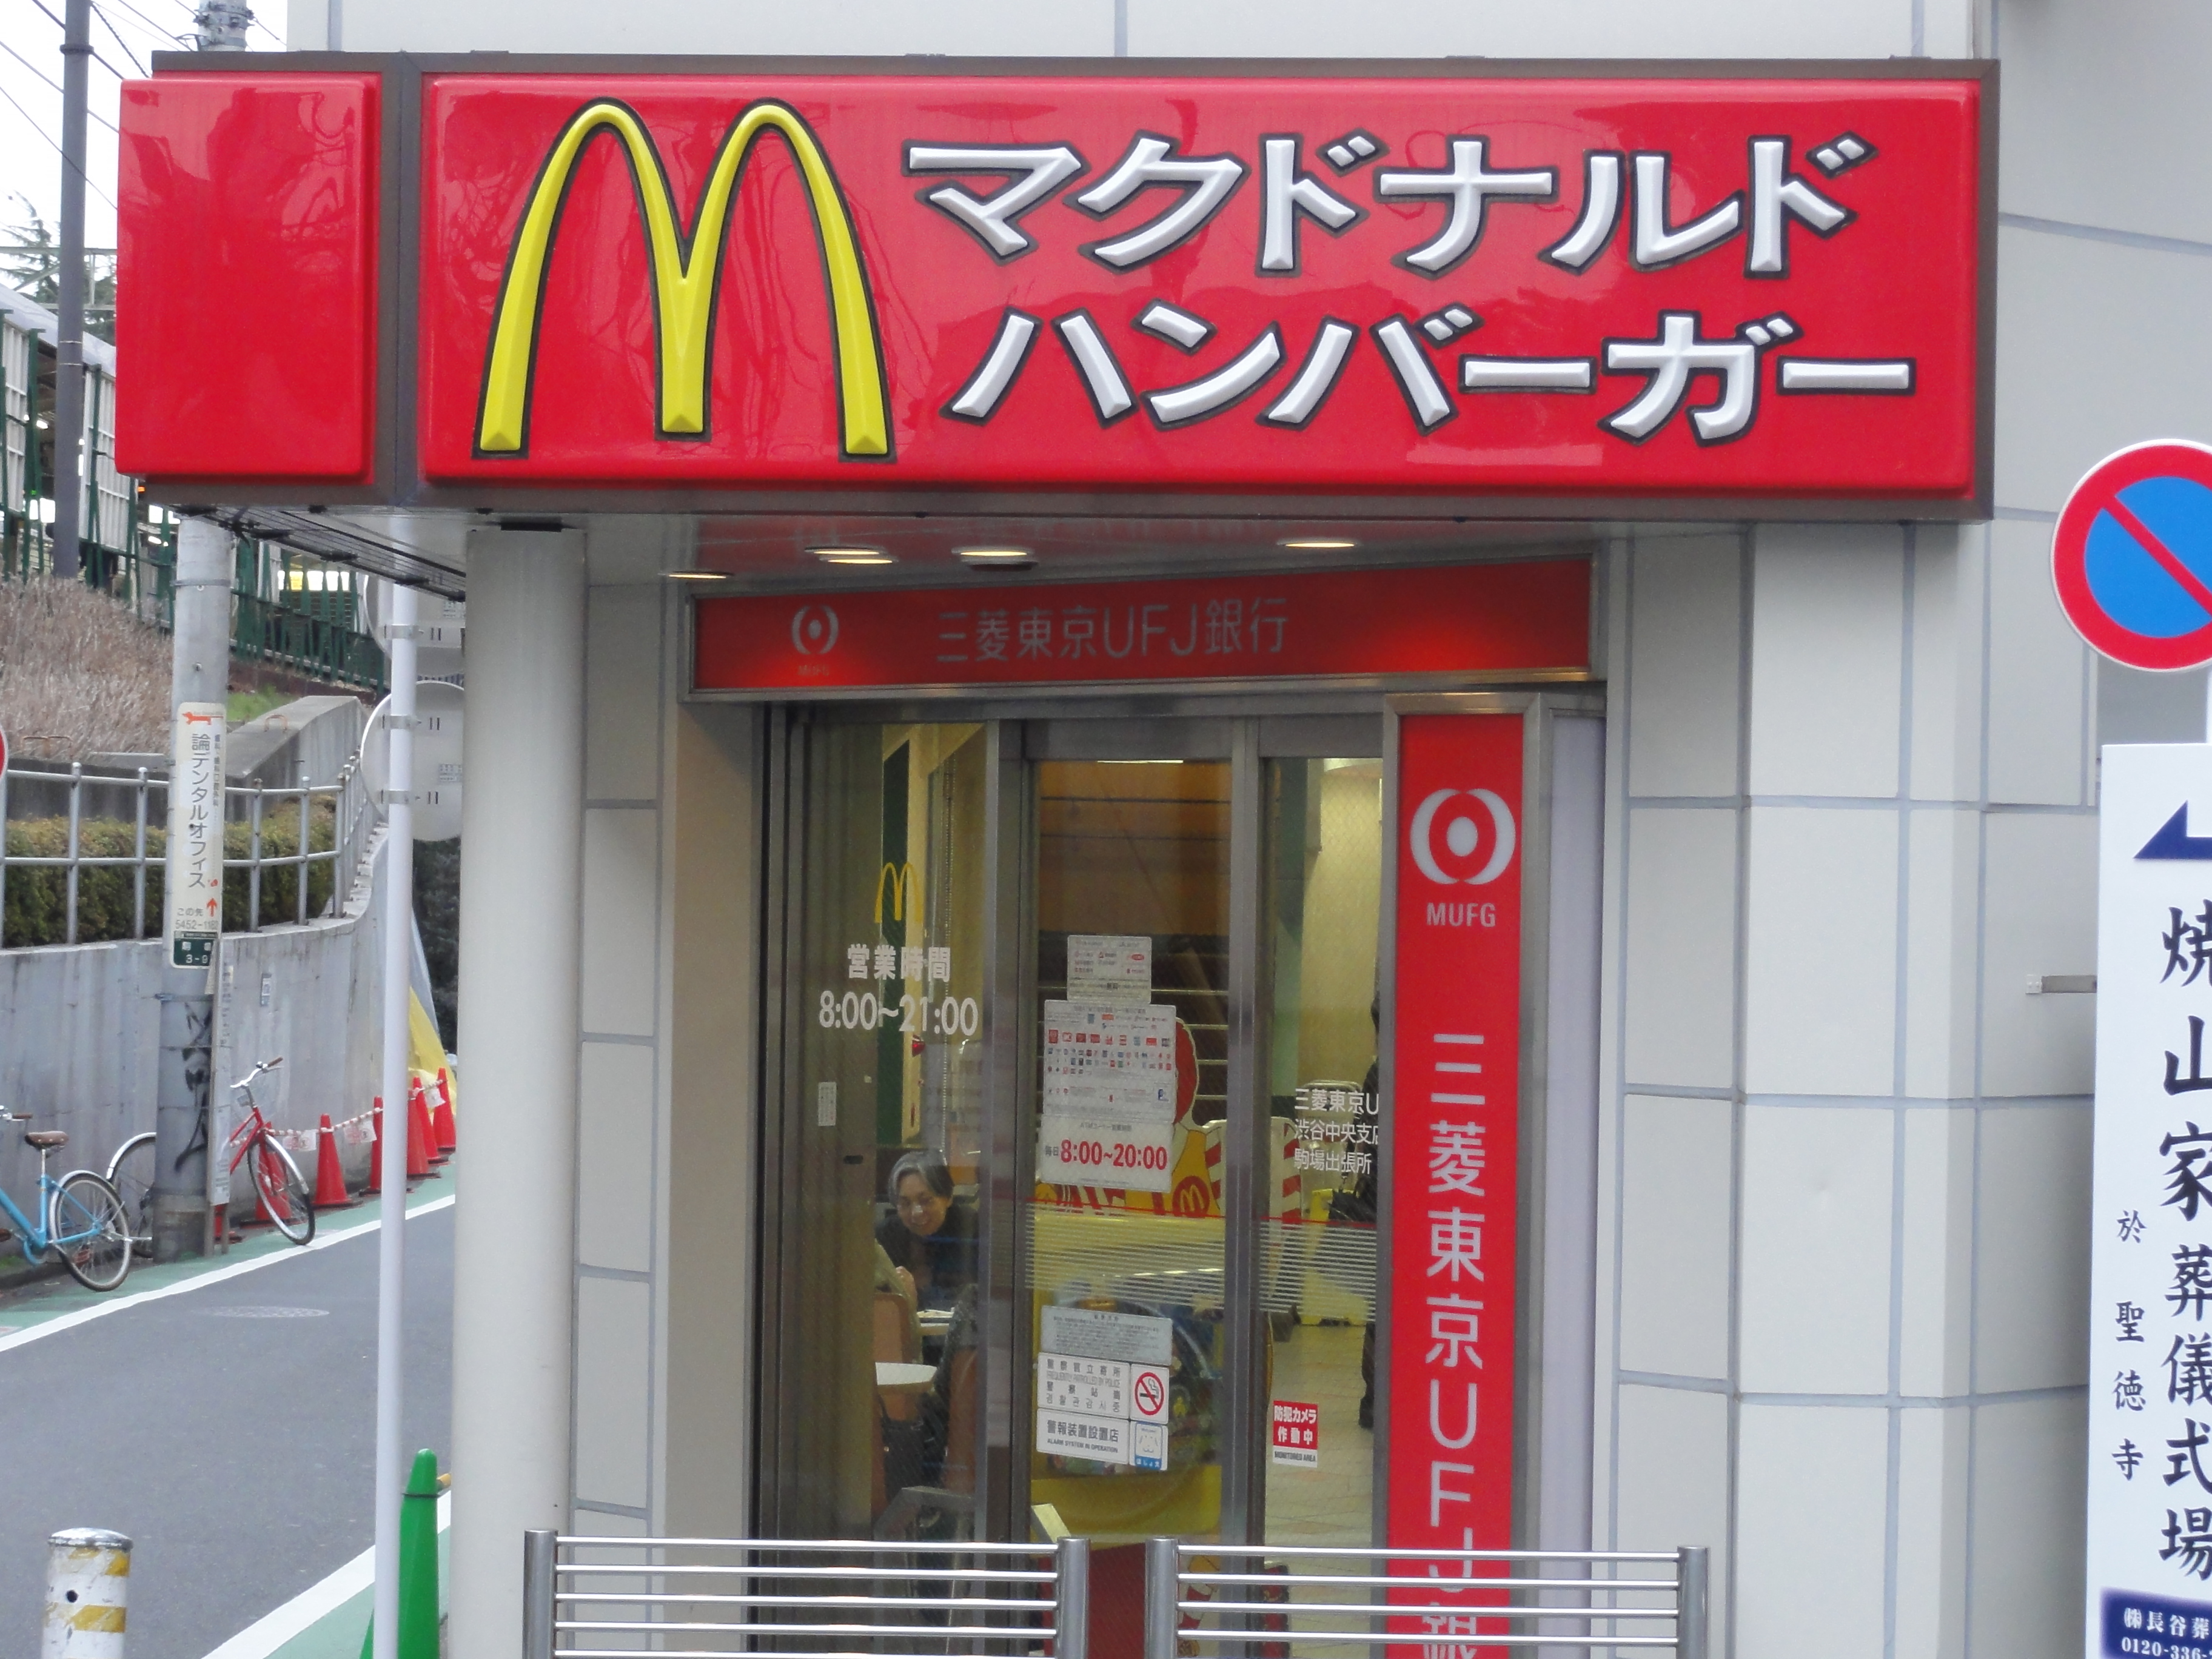 Tokyo McDonald's sign in katakana Japanese alphabet